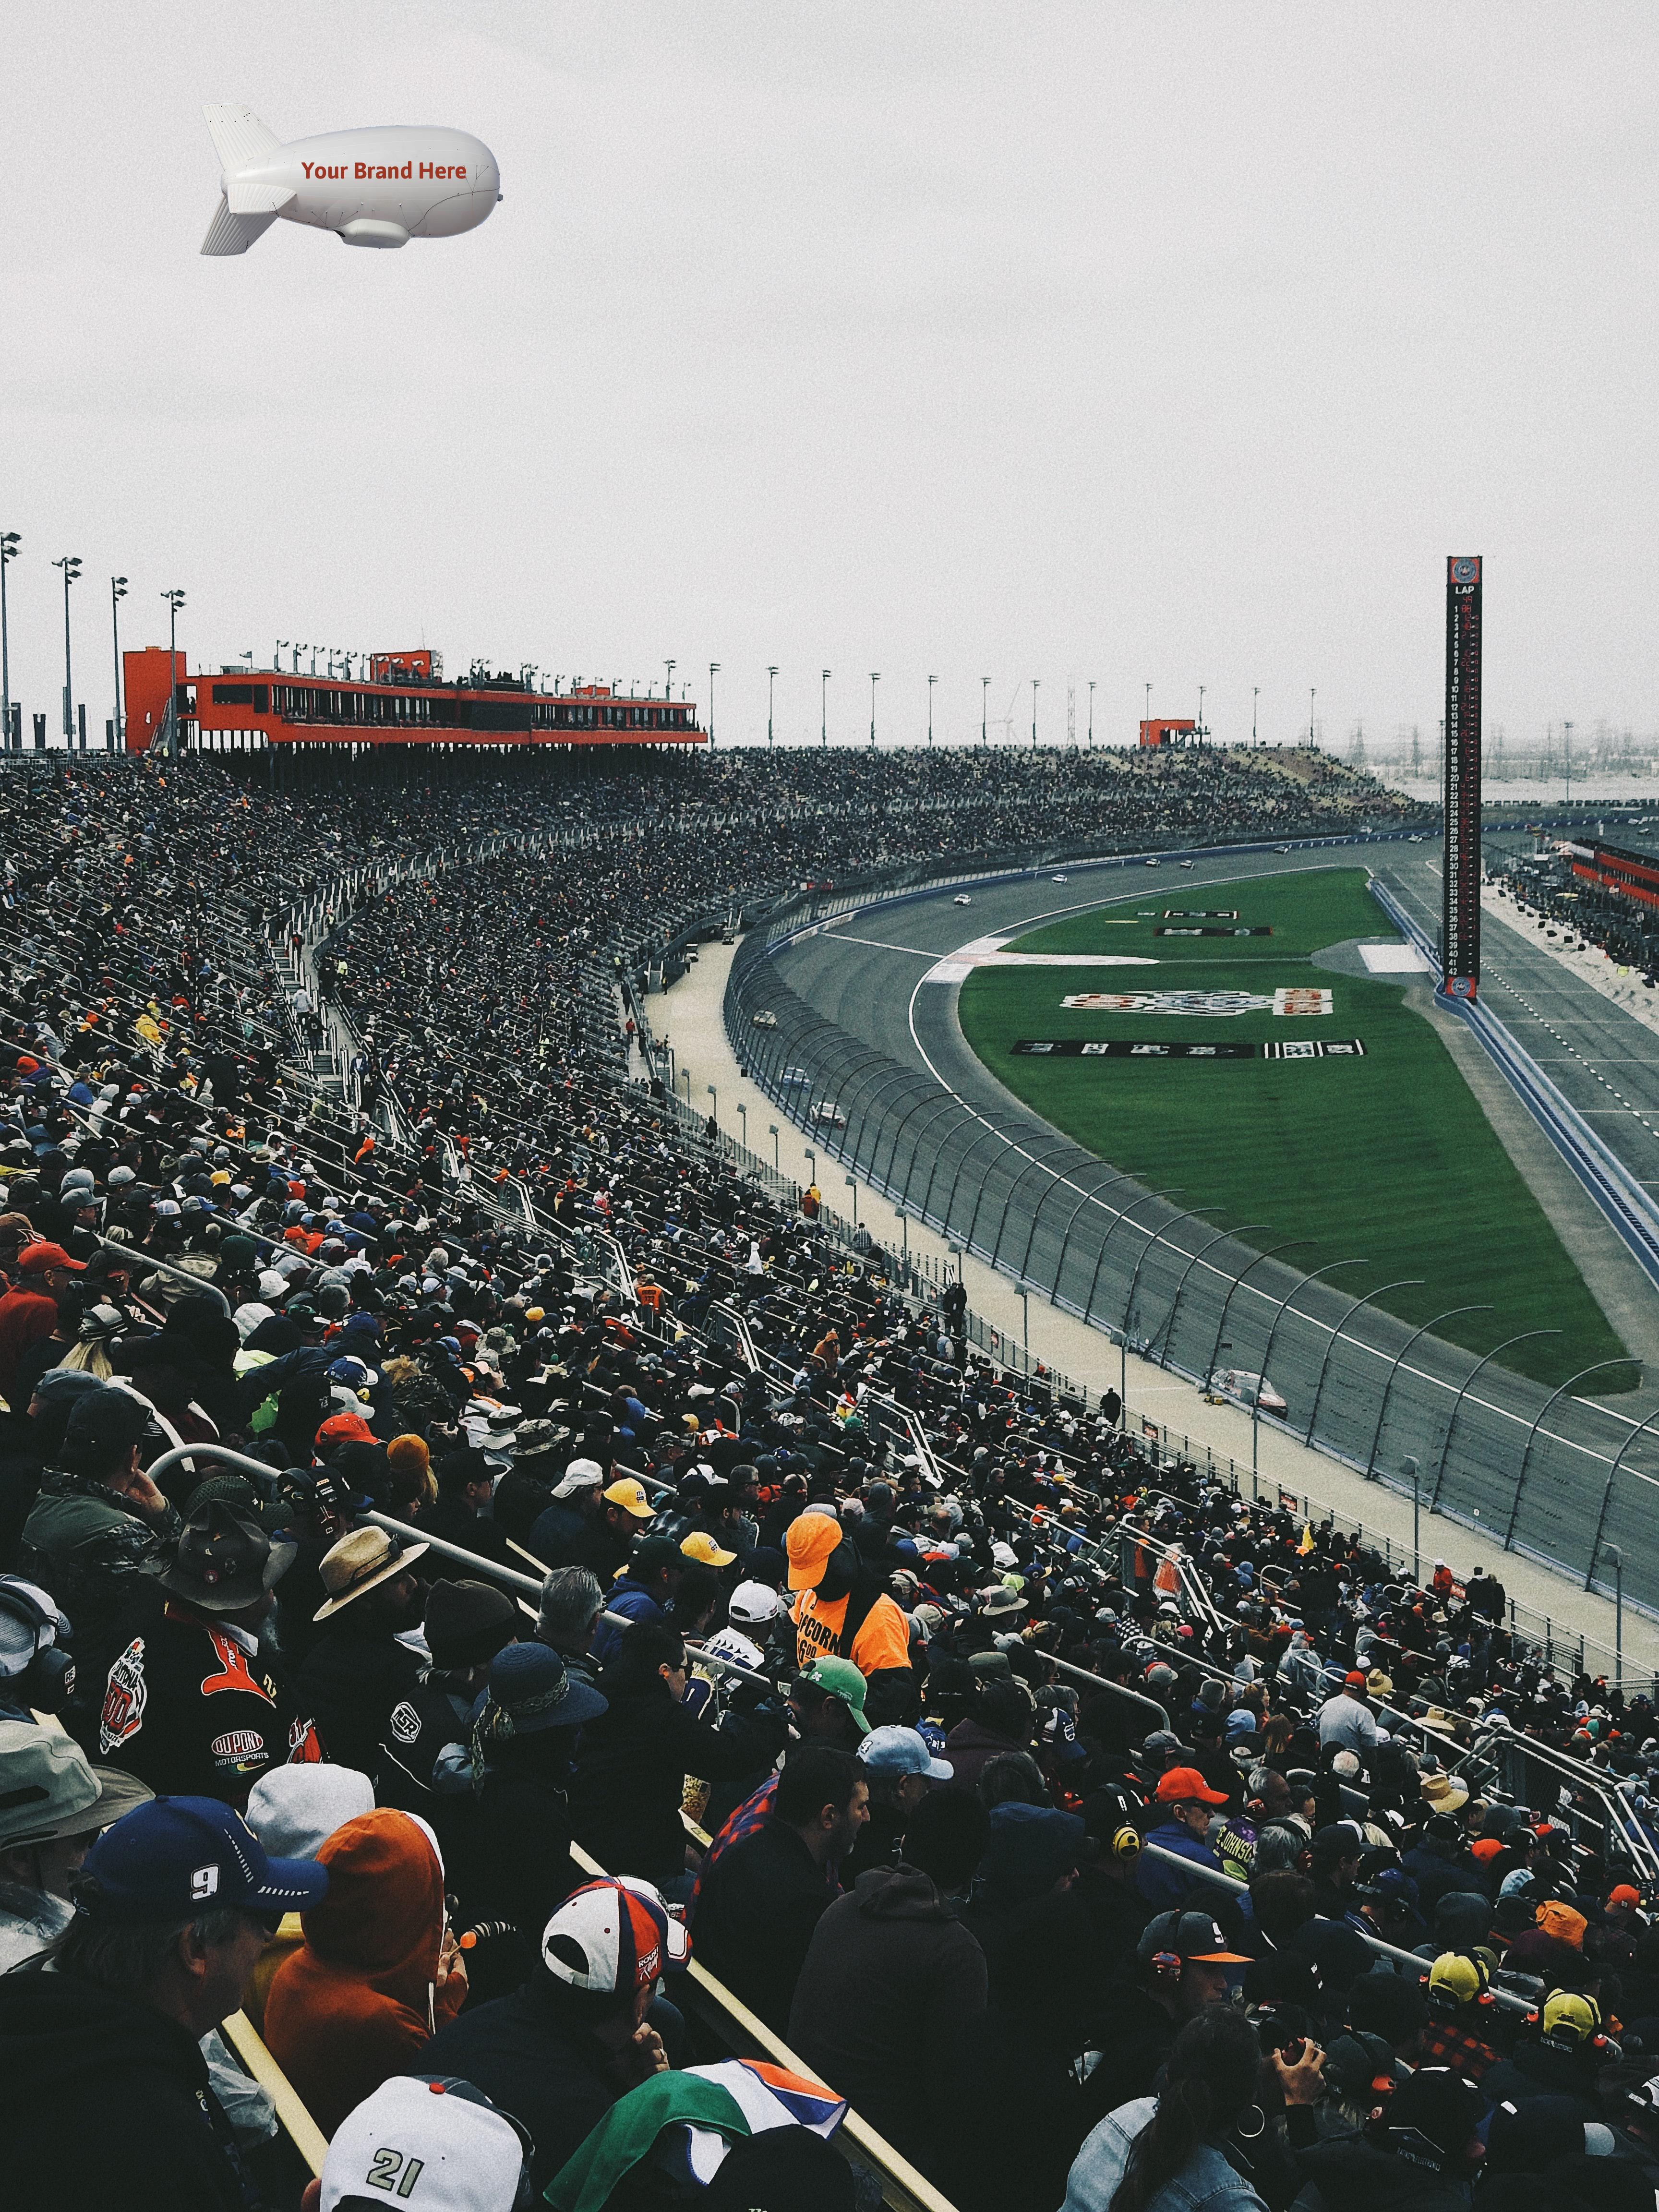 A SuperTower floats over a NASCAR race